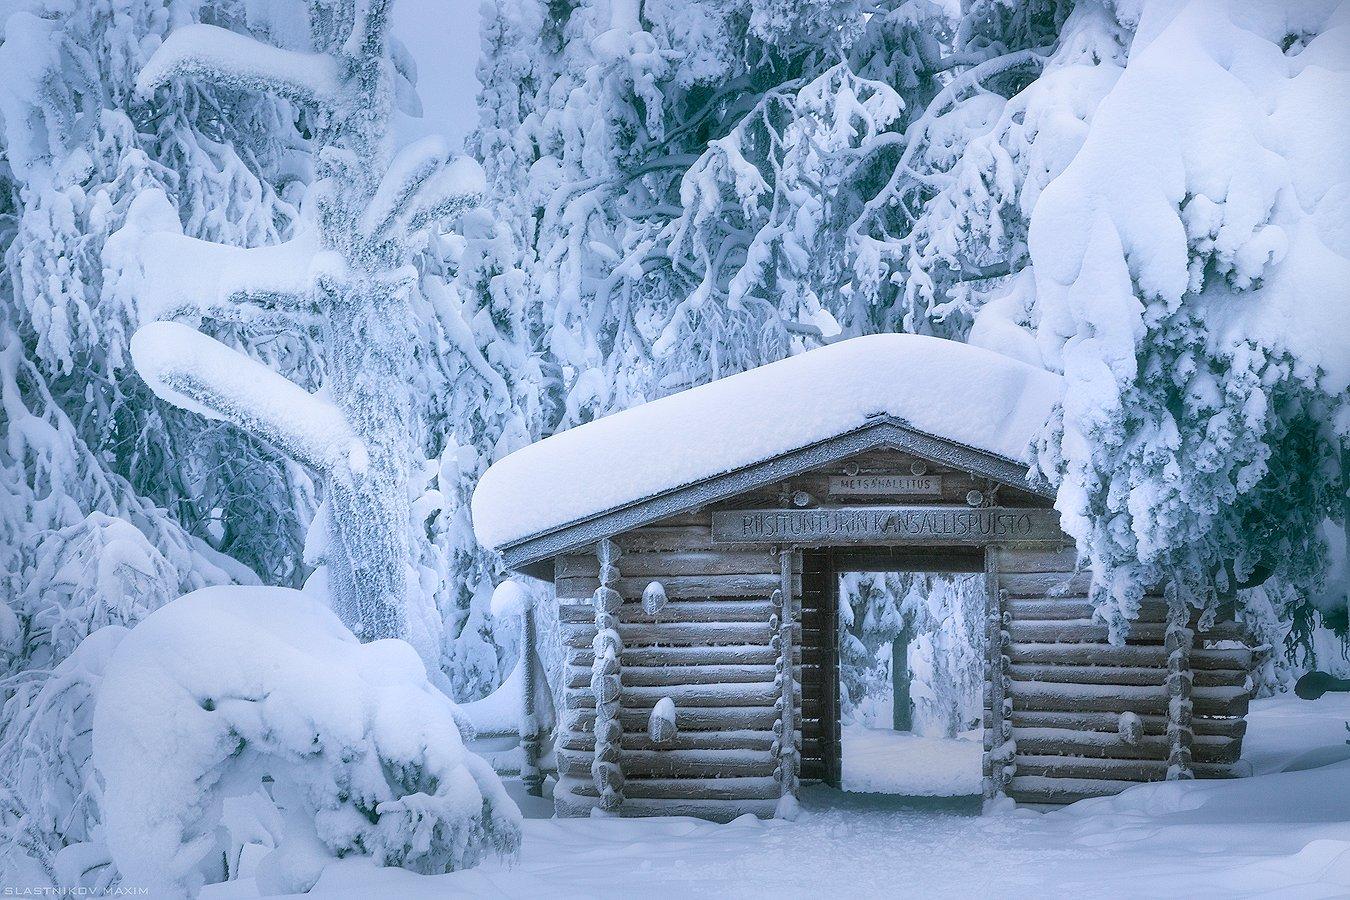 финляндия, снег, дерево, дом, тропинка, сугробы, мороз, холод, лес, путешествие, парк, travel, explore, snow, frost, trees, forest, travel, trekking, day, winter, Максим Сластников